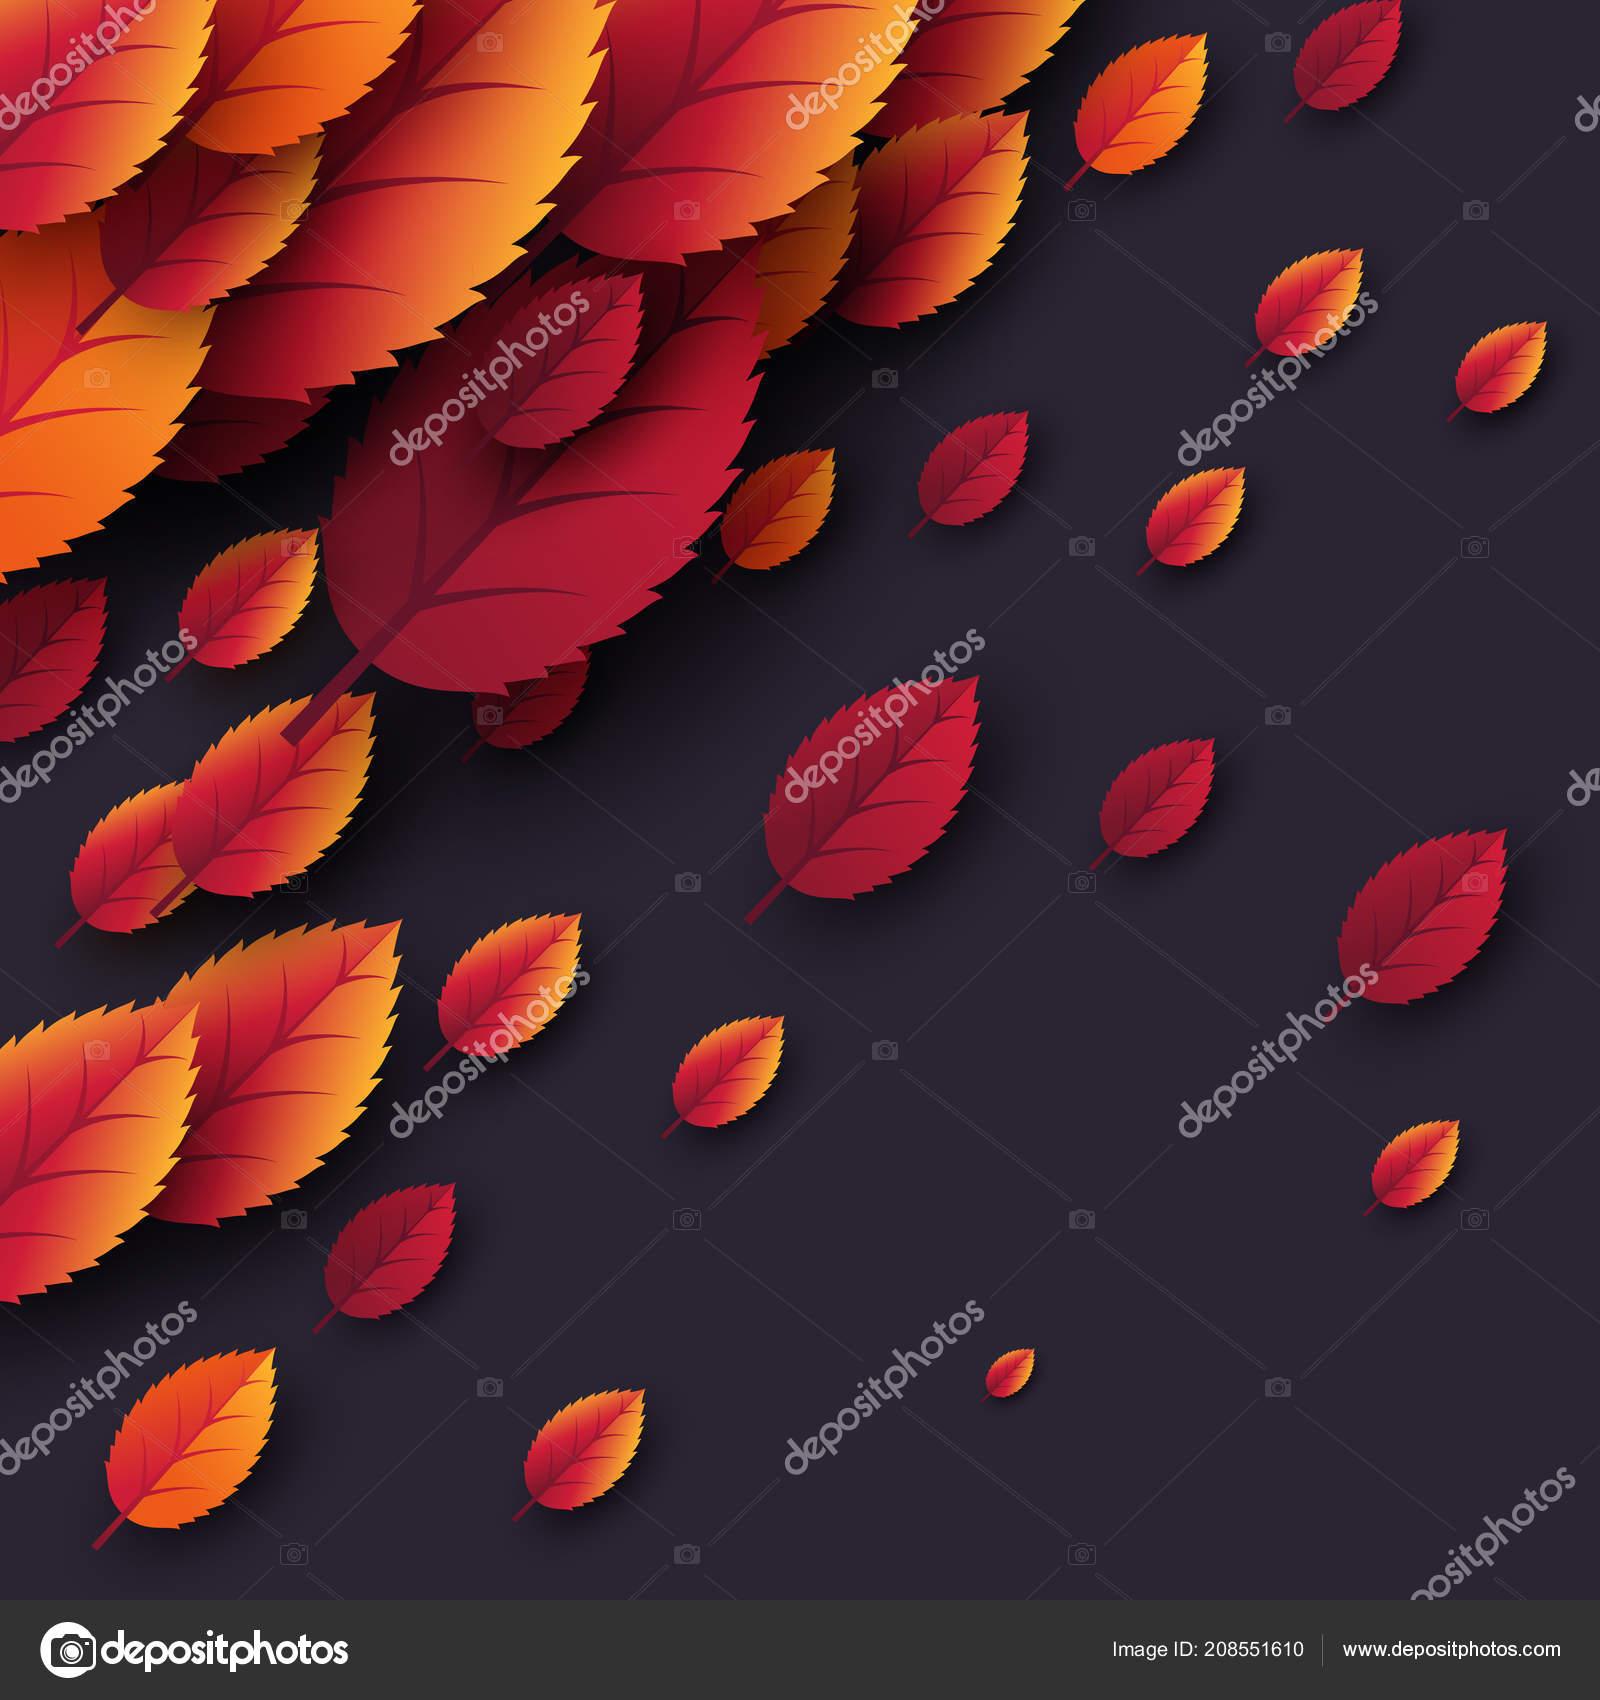 Dark Fall Wallpaper 3d Realistic Autumn Fall Leaves